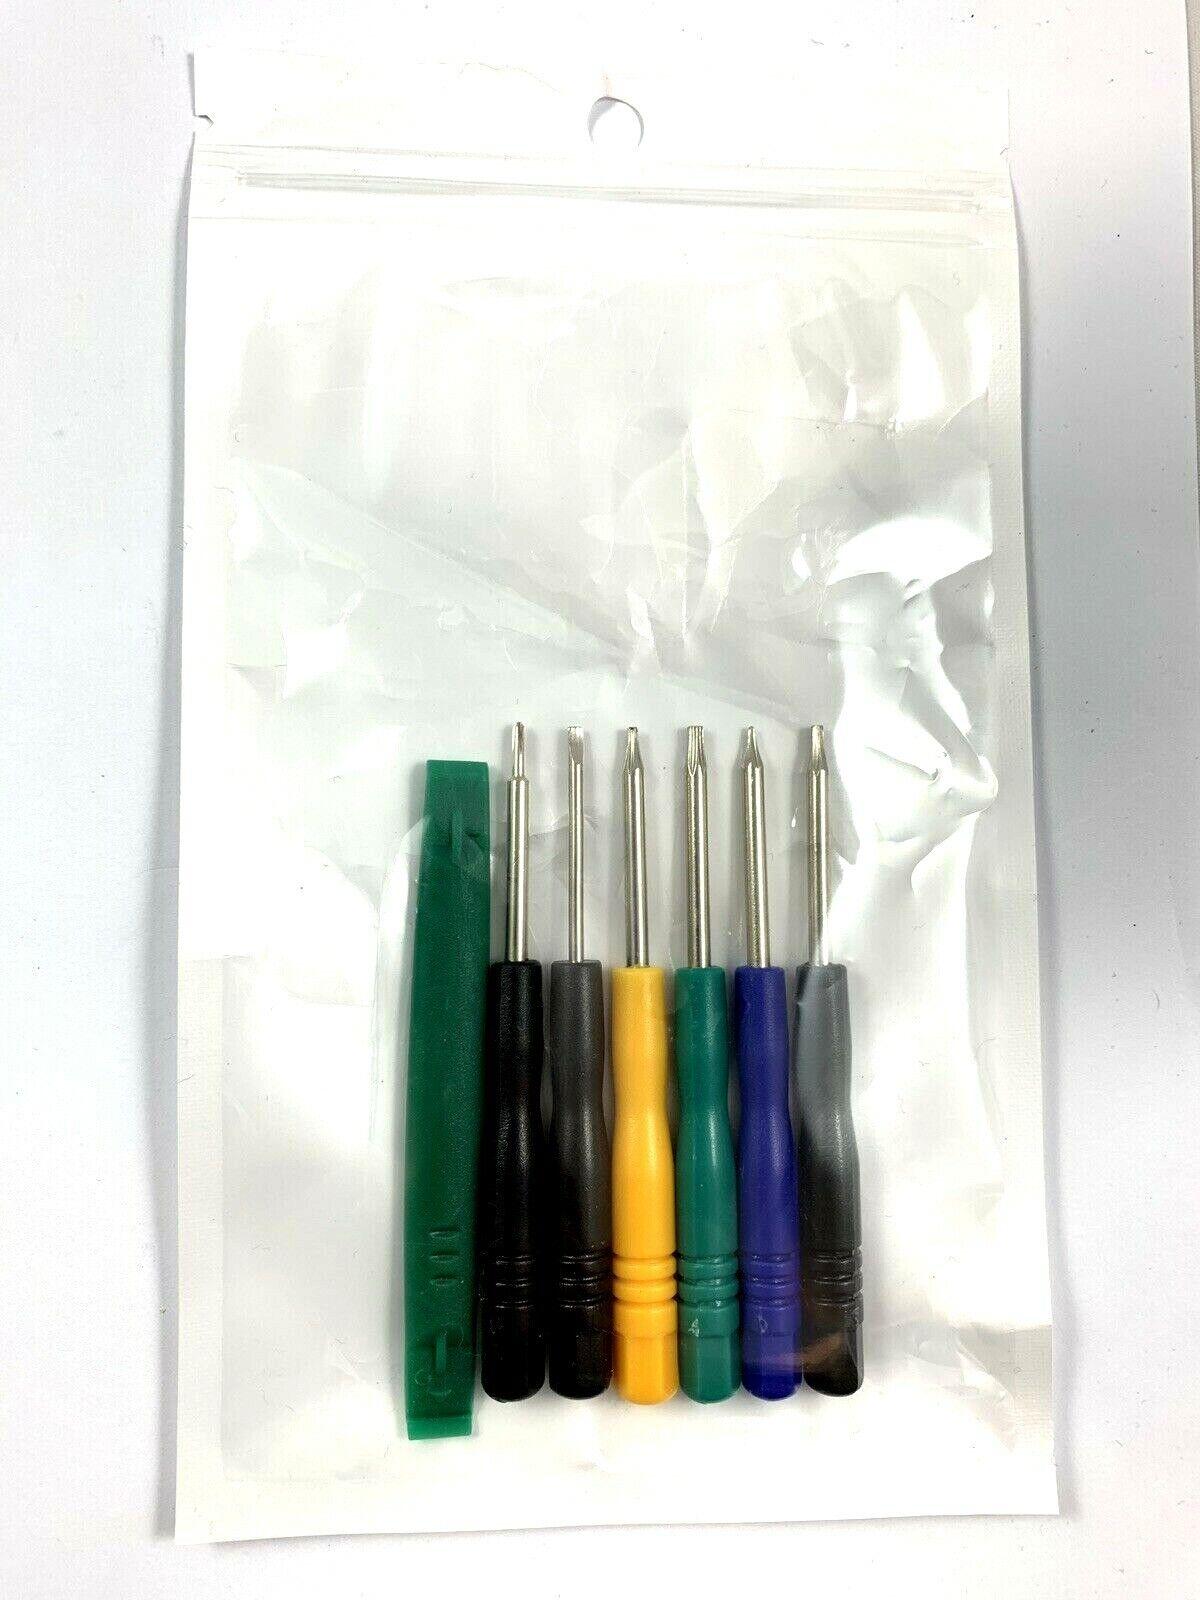 *NEW* 7 Tools Set kit for MAGELLAN GPS Battery install *USA SELLER FREE SHIPPING